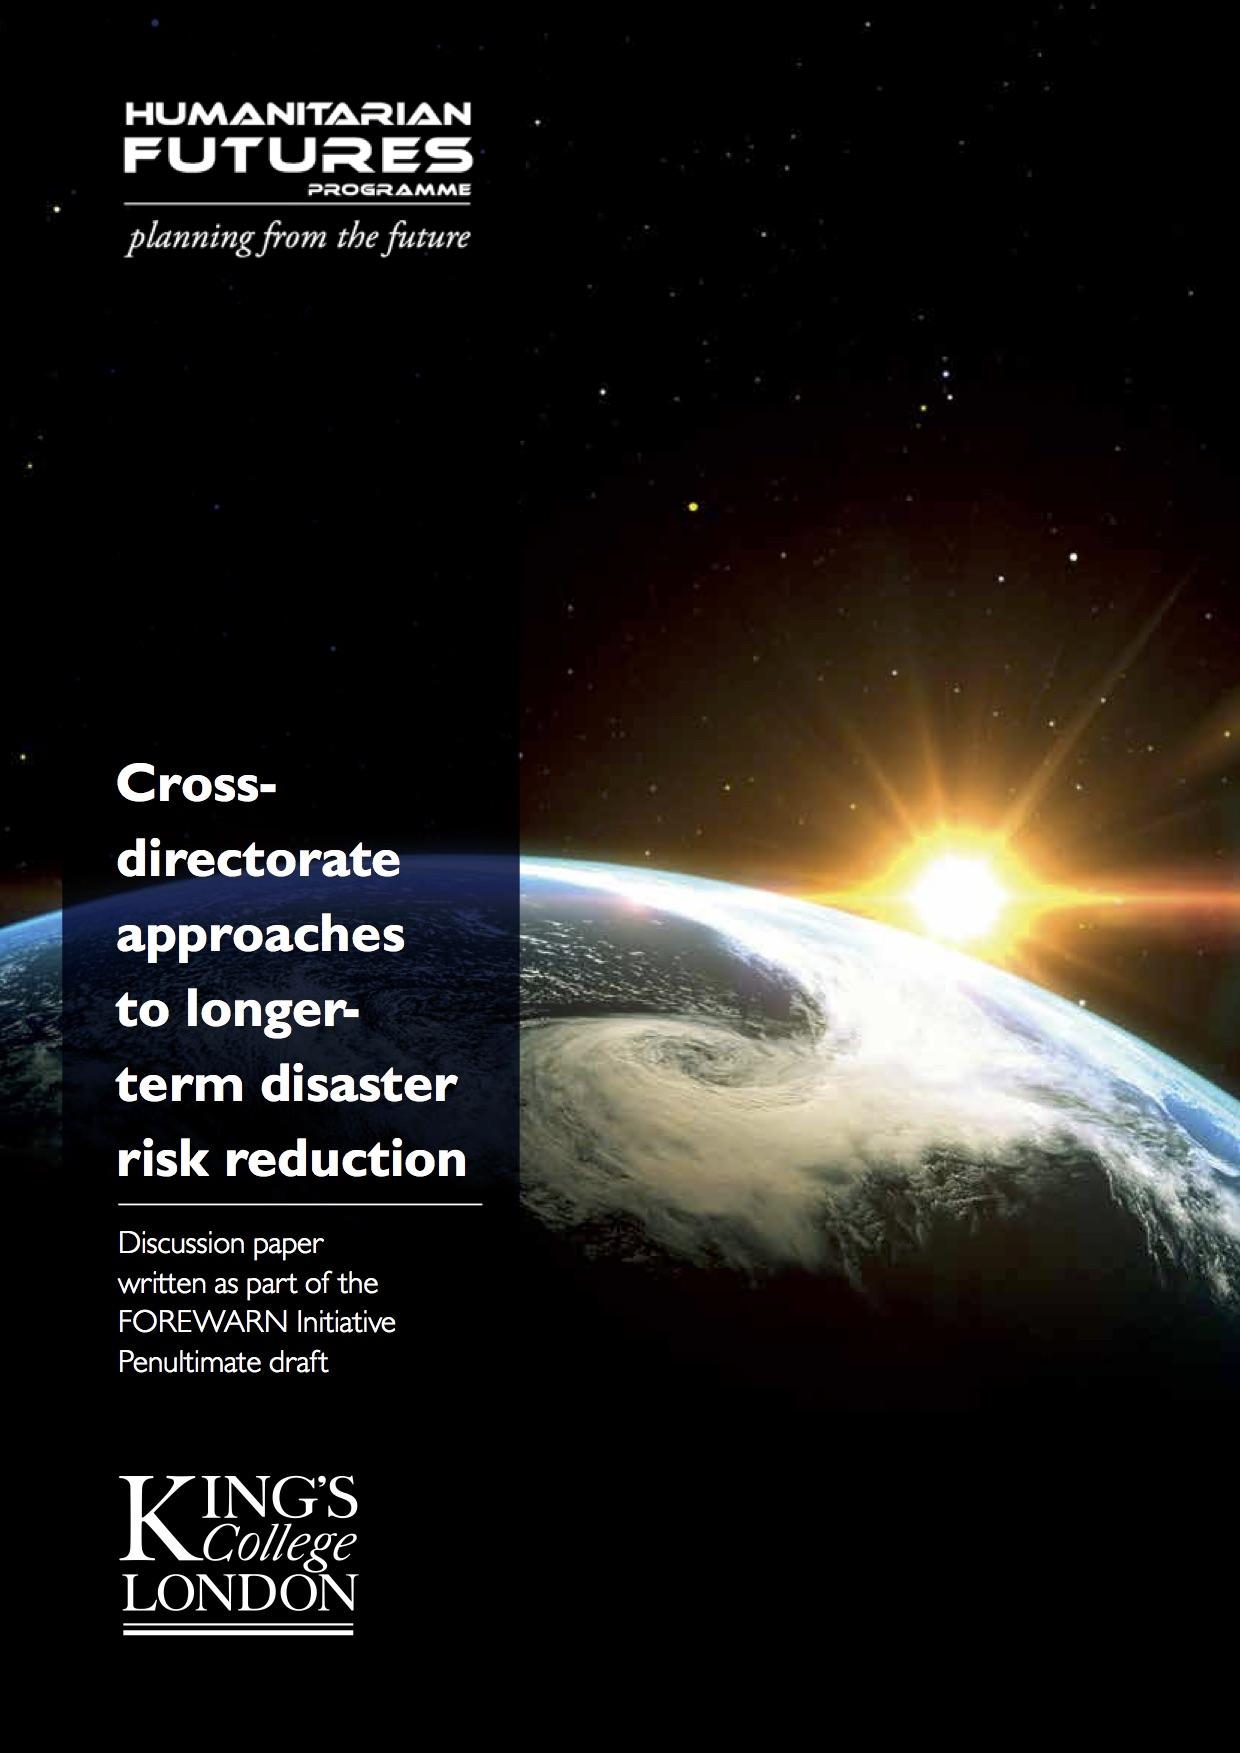 FOREWARN Cross-directorate DRR Report